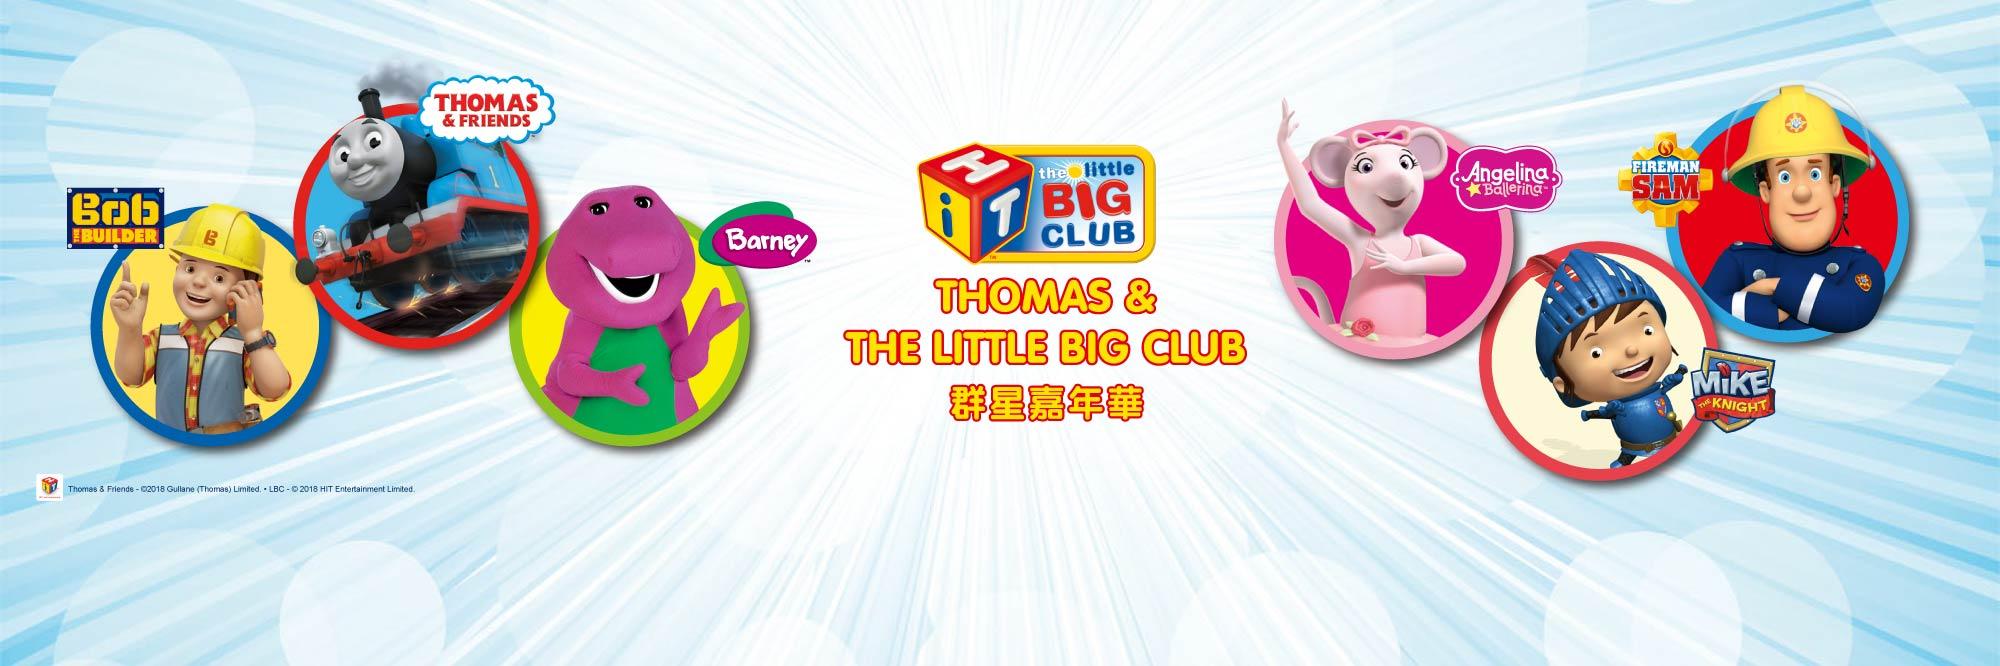 THE LITTLE BIG CLUB 群星主題活動